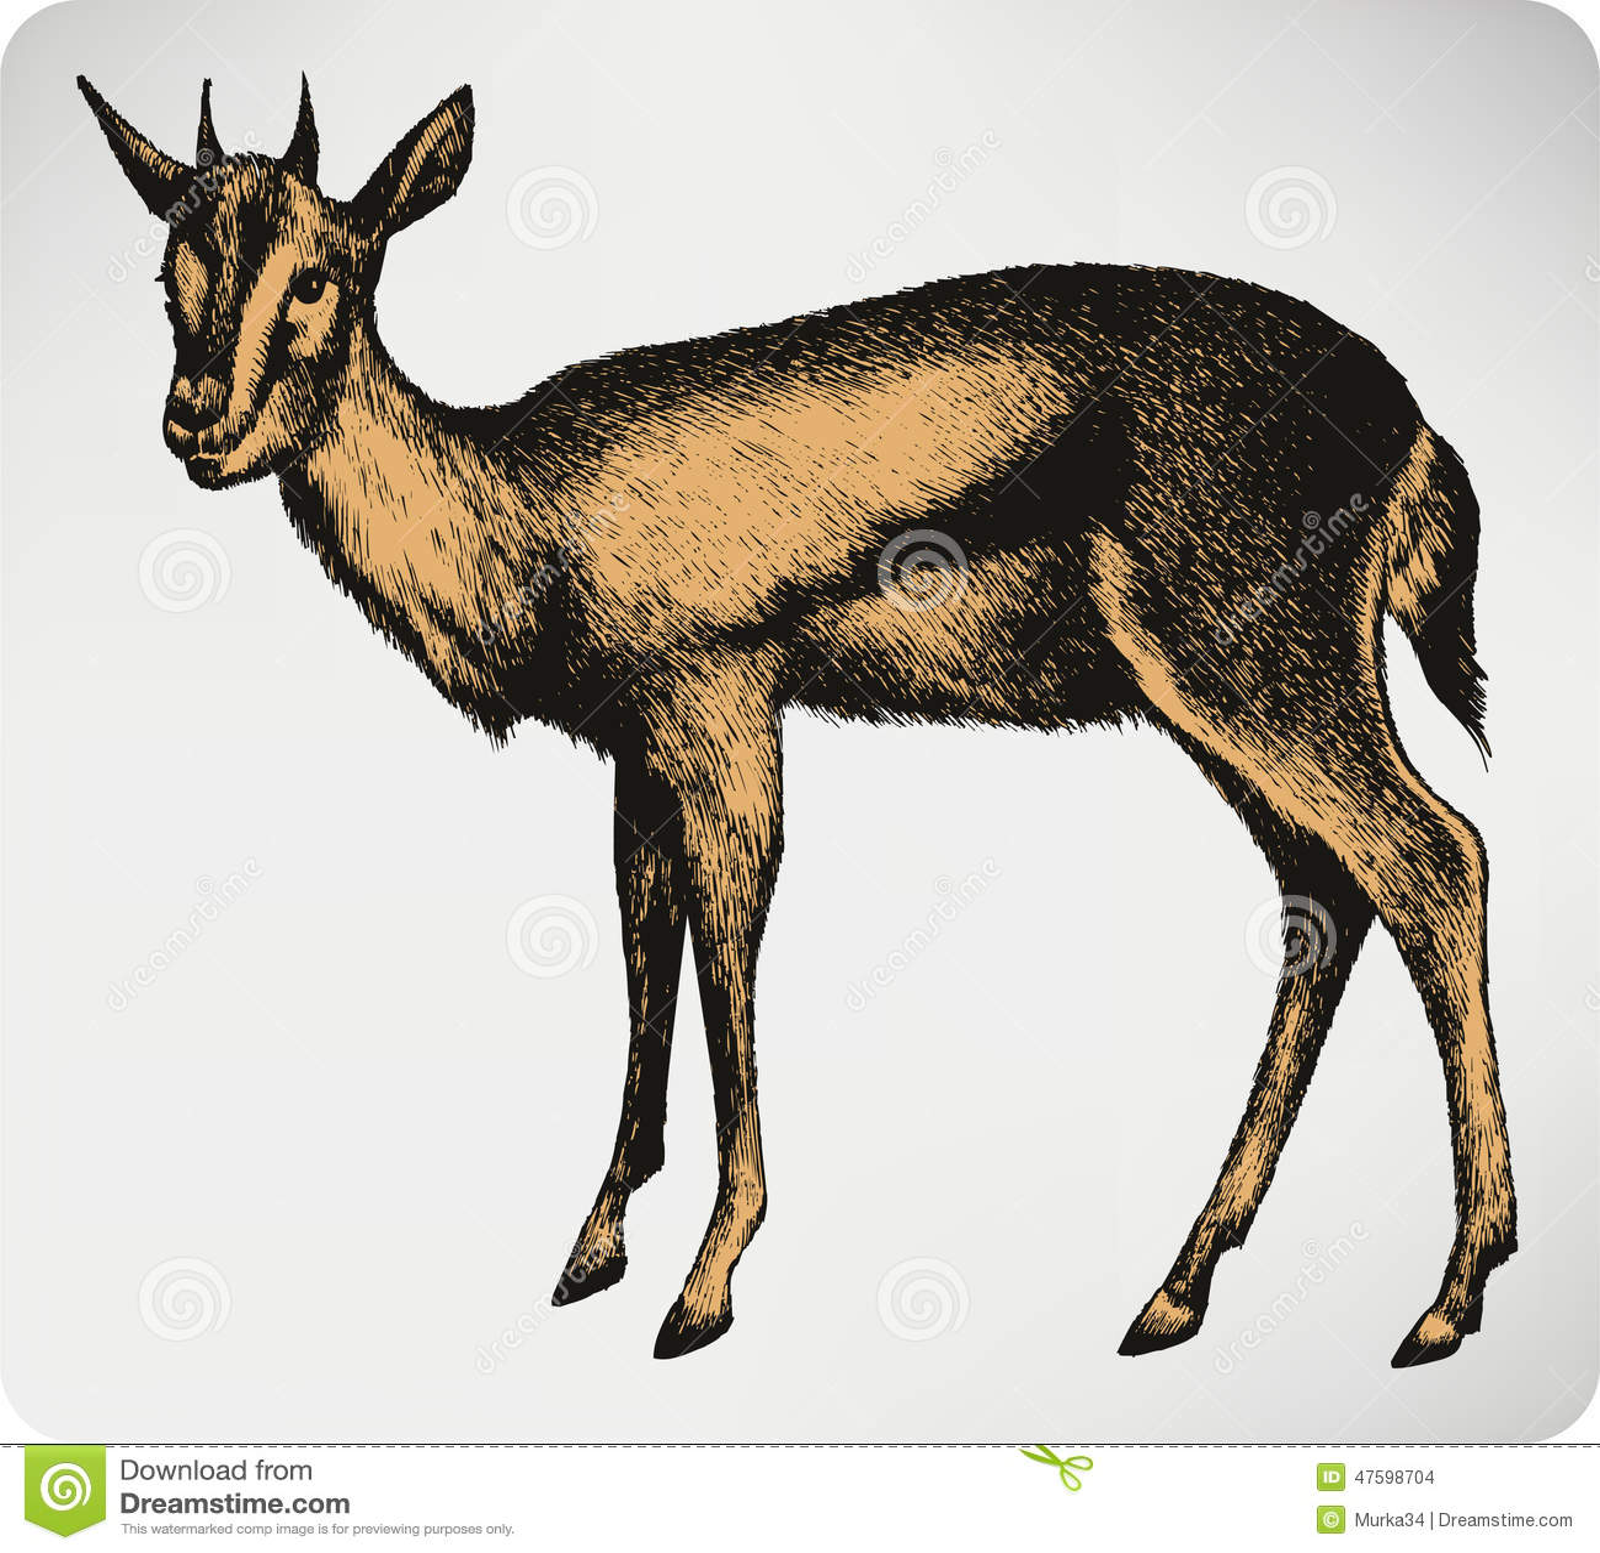 Animal de gazelle main dessin illustration de vecteur illustration de vecteur illustration du - Gazelle dessin ...